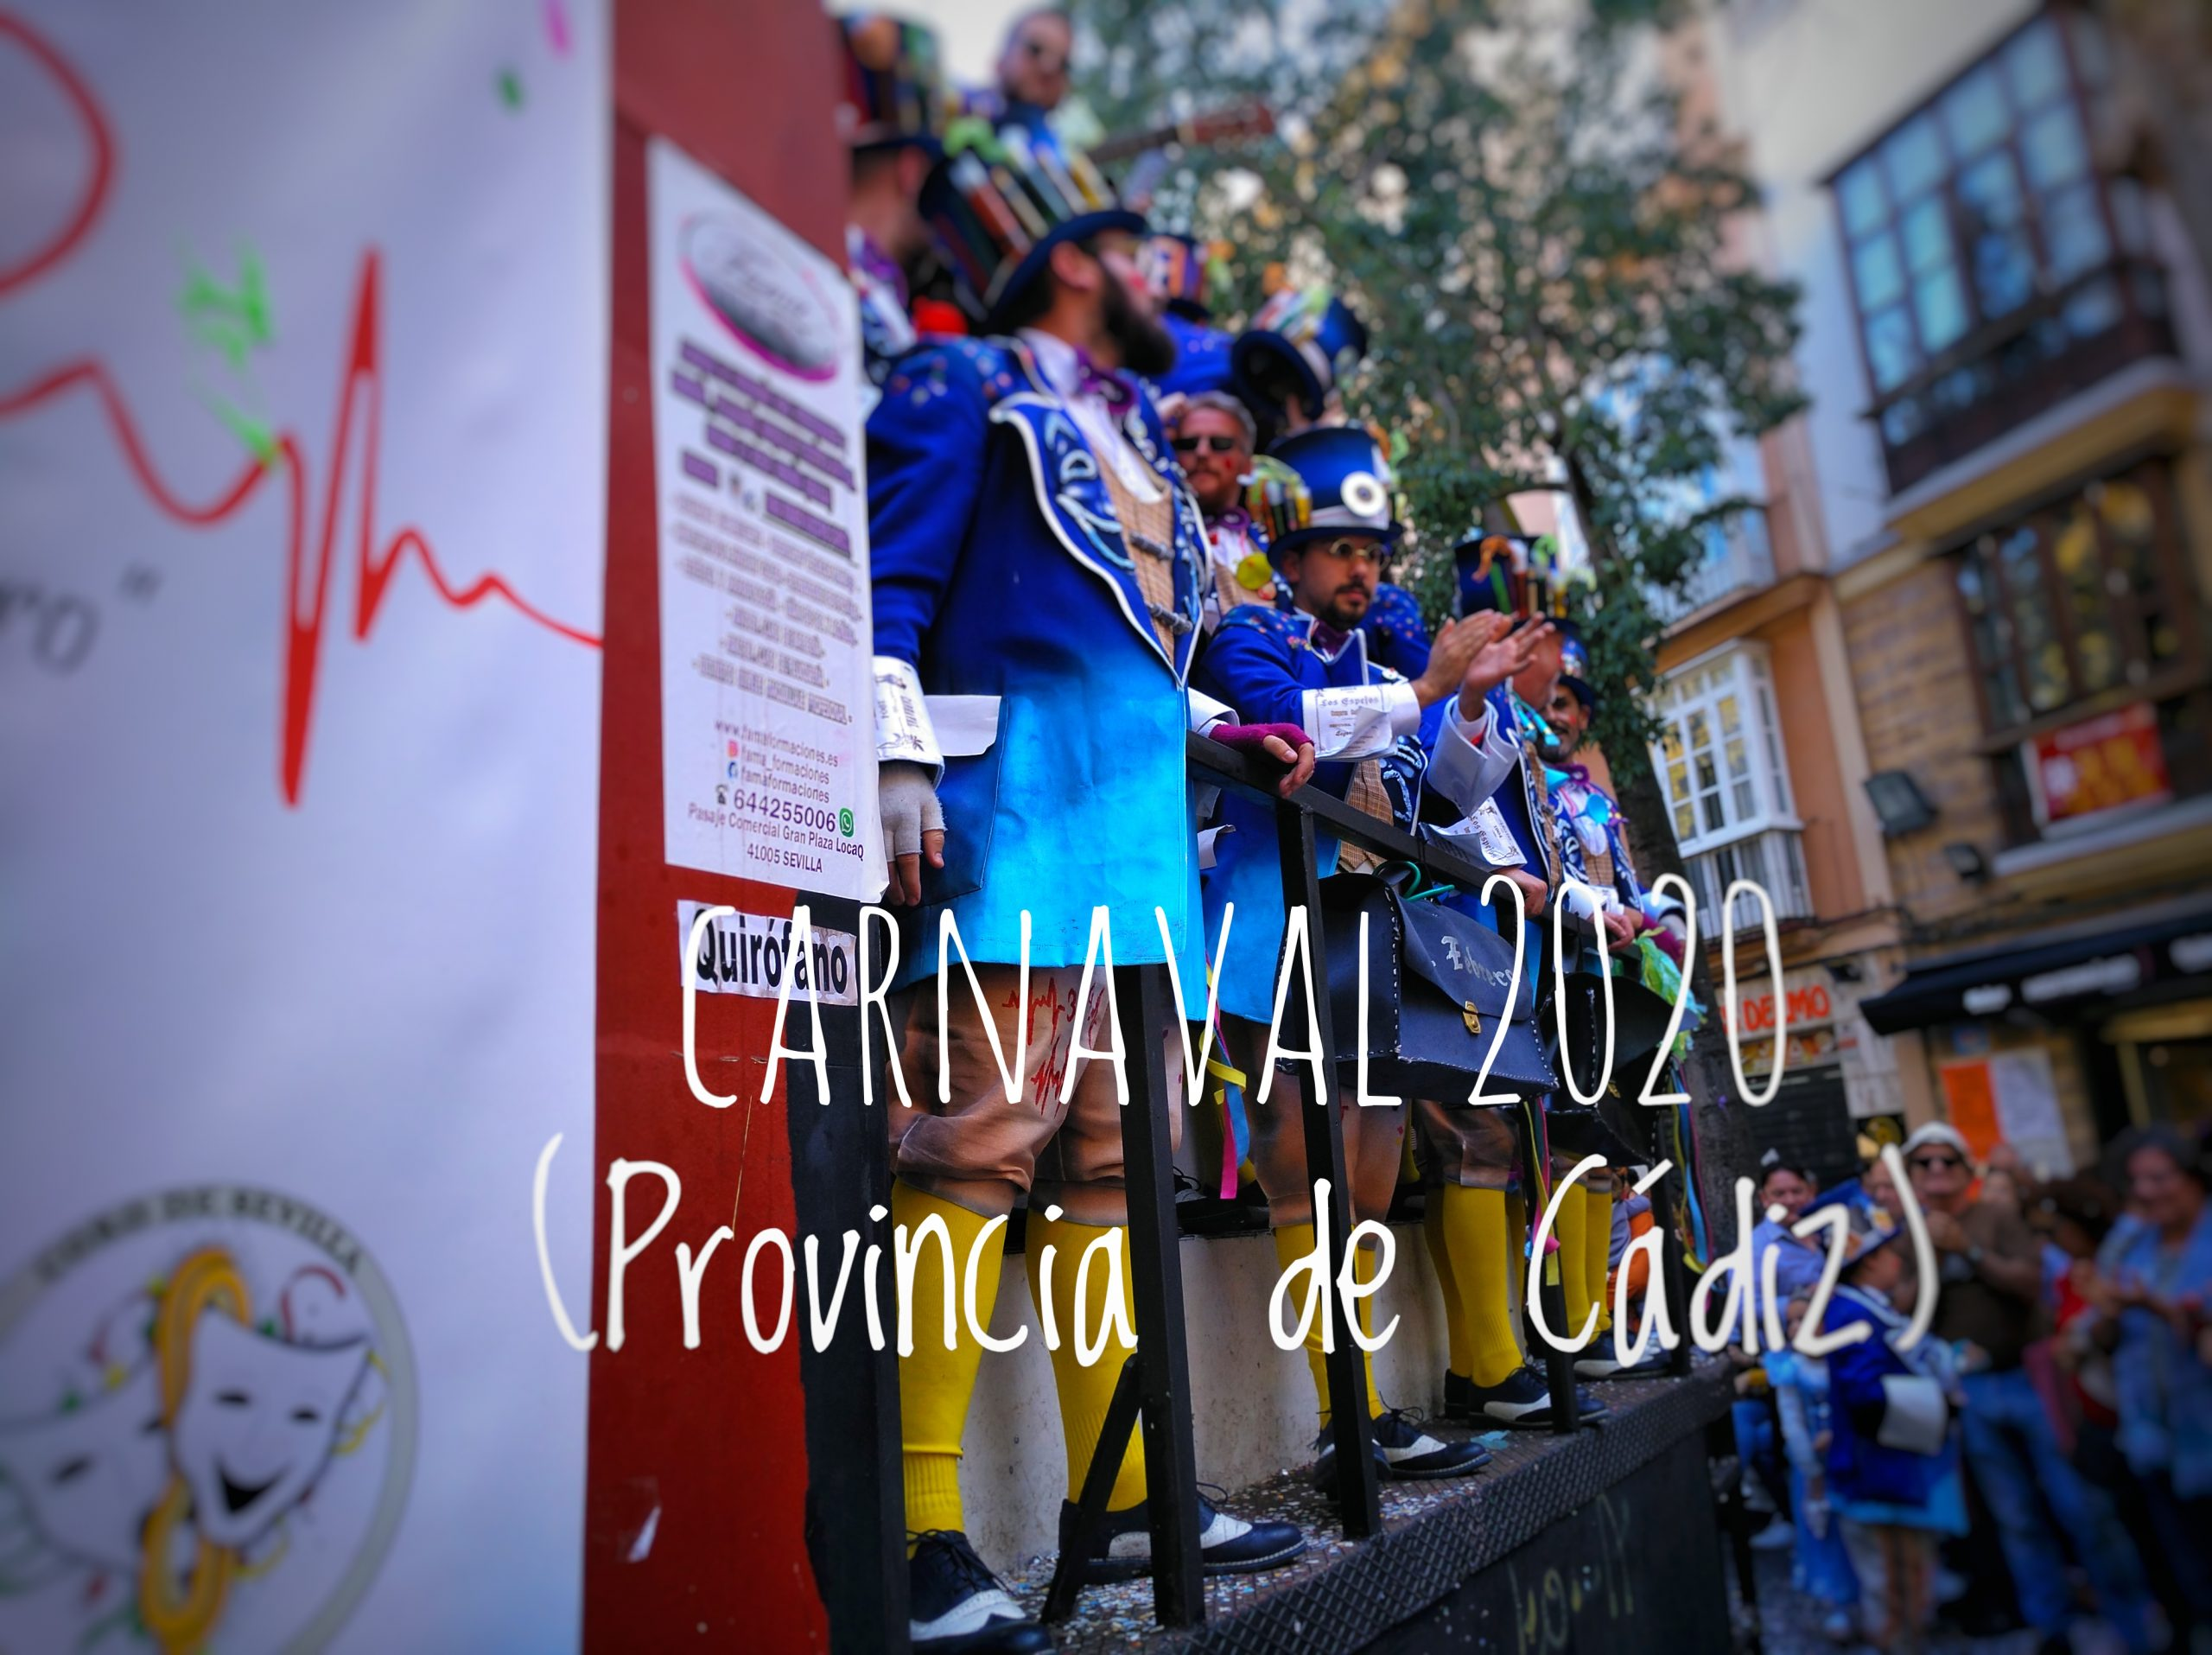 Carnaval 2020 Provincia de Cádiz